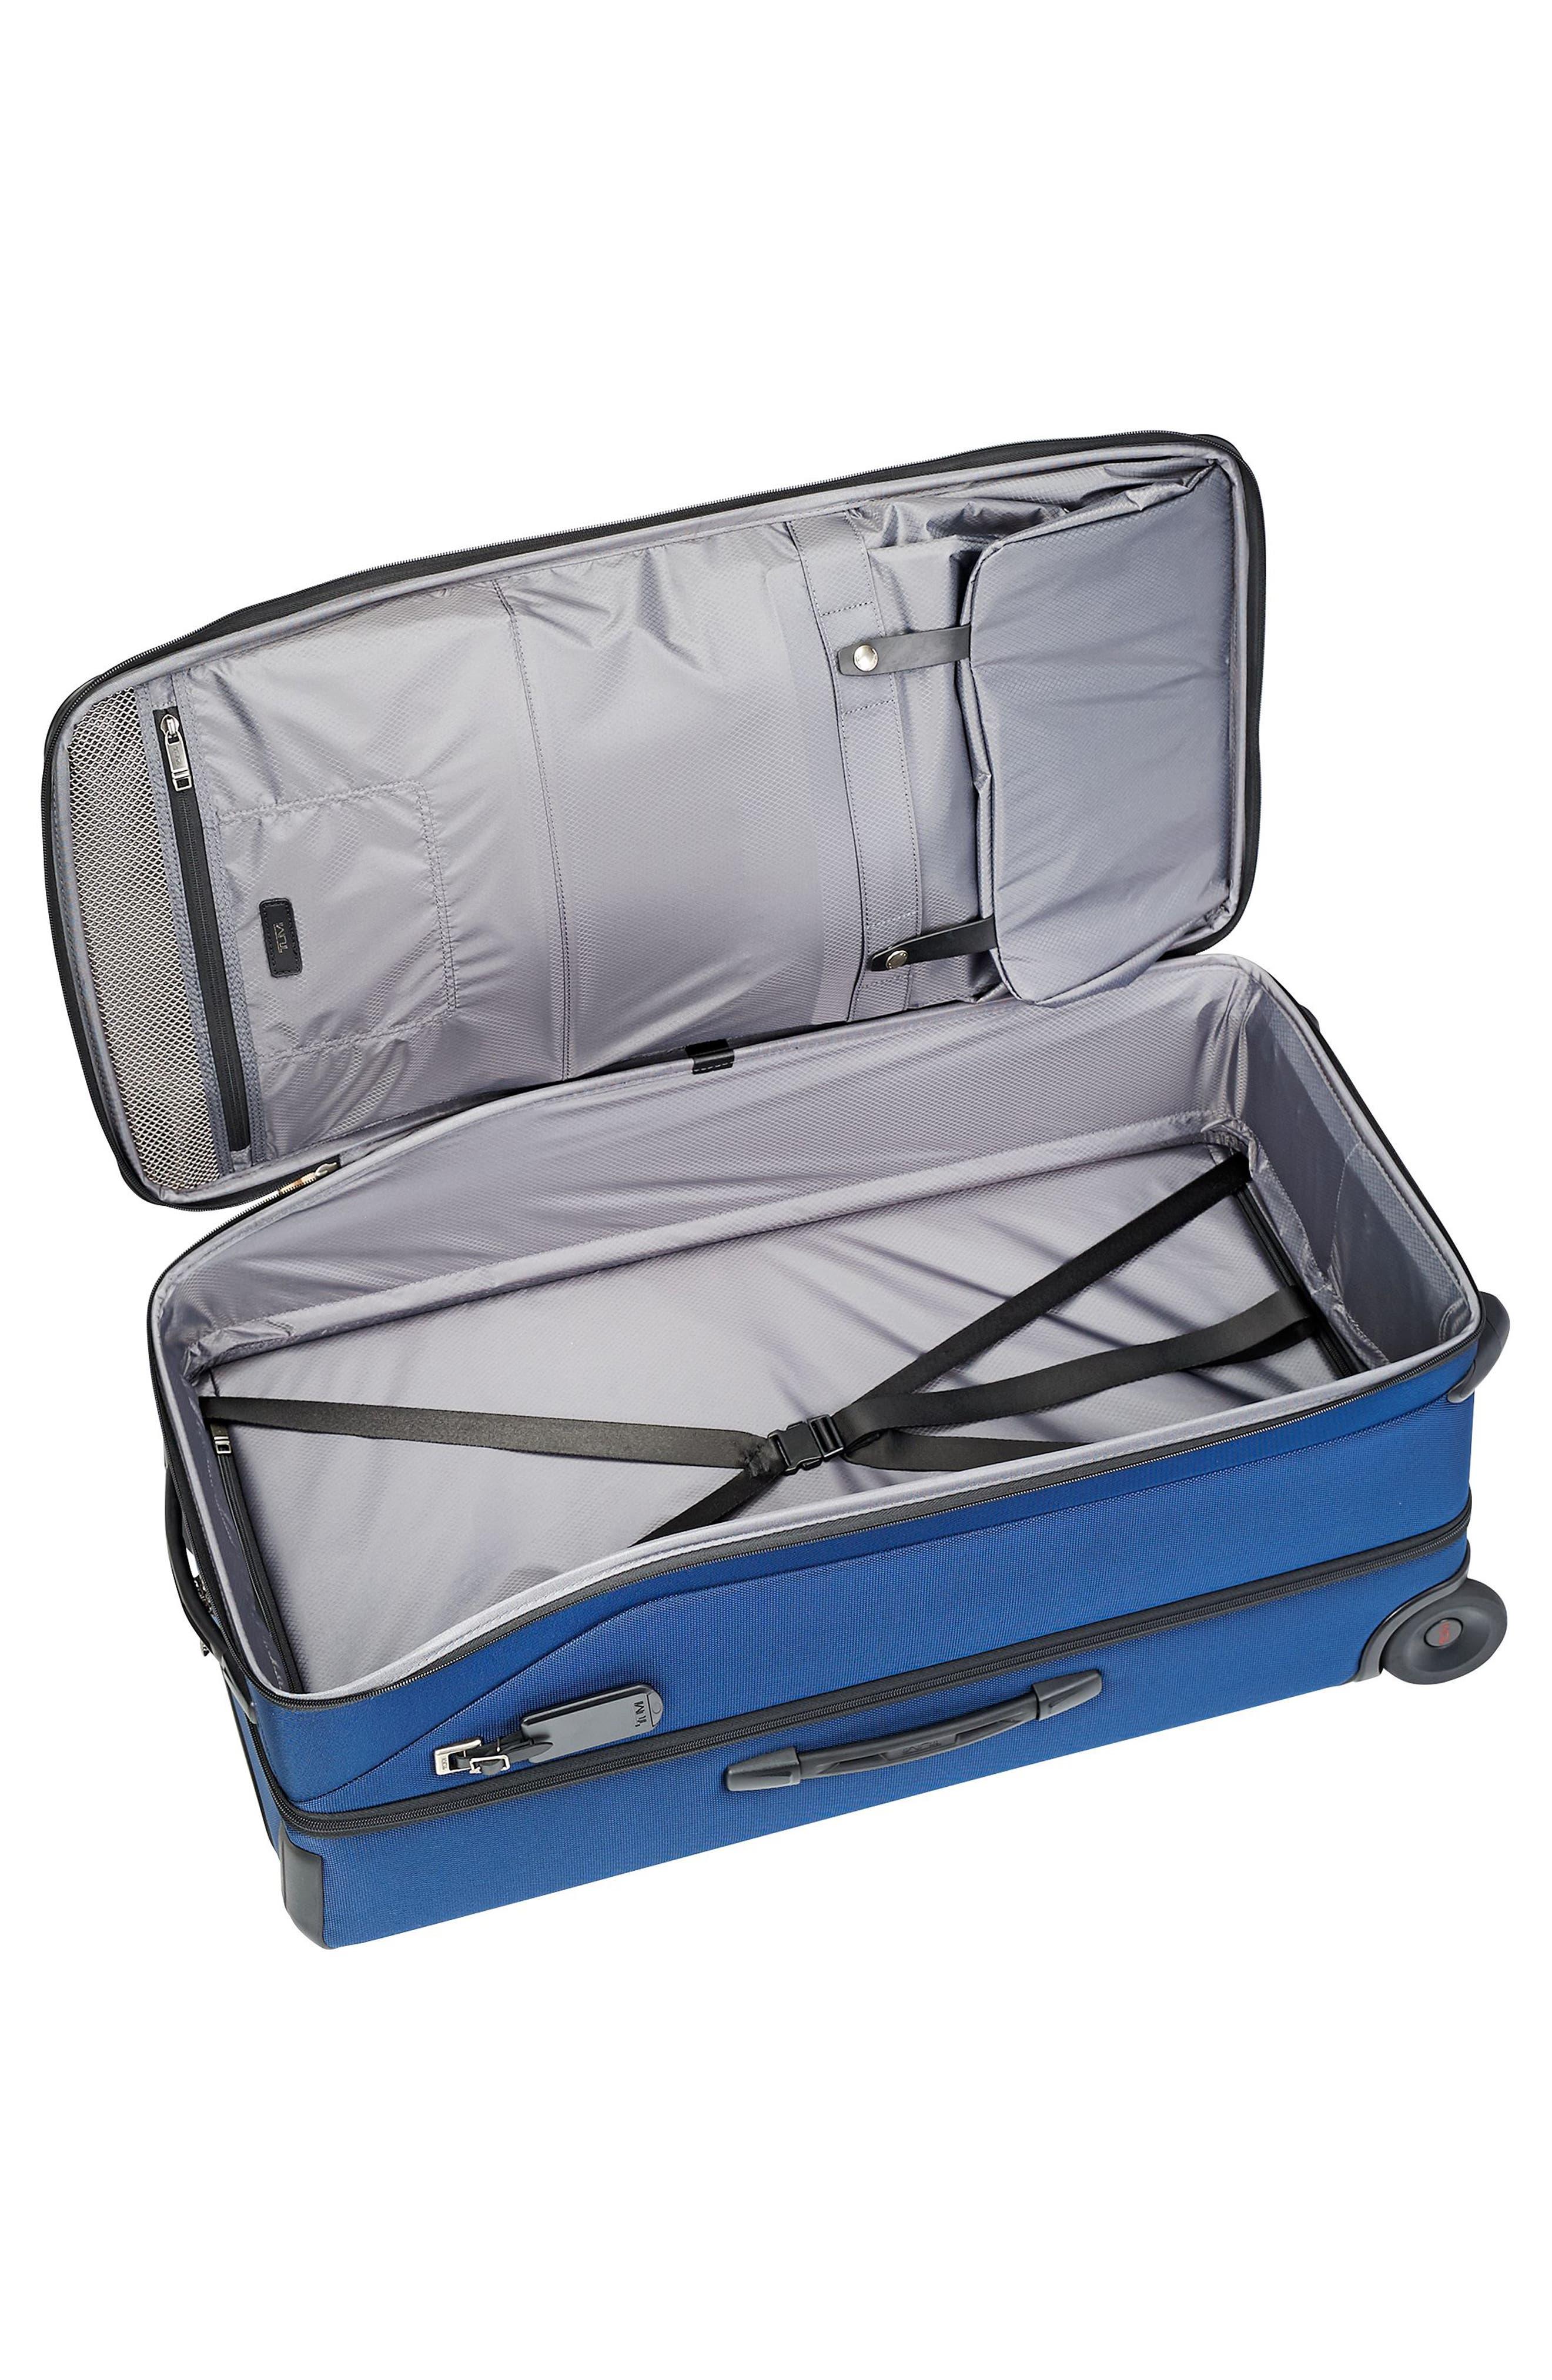 Merge - Rolling Duffel Bag,                             Alternate thumbnail 2, color,                             OCEAN BLUE